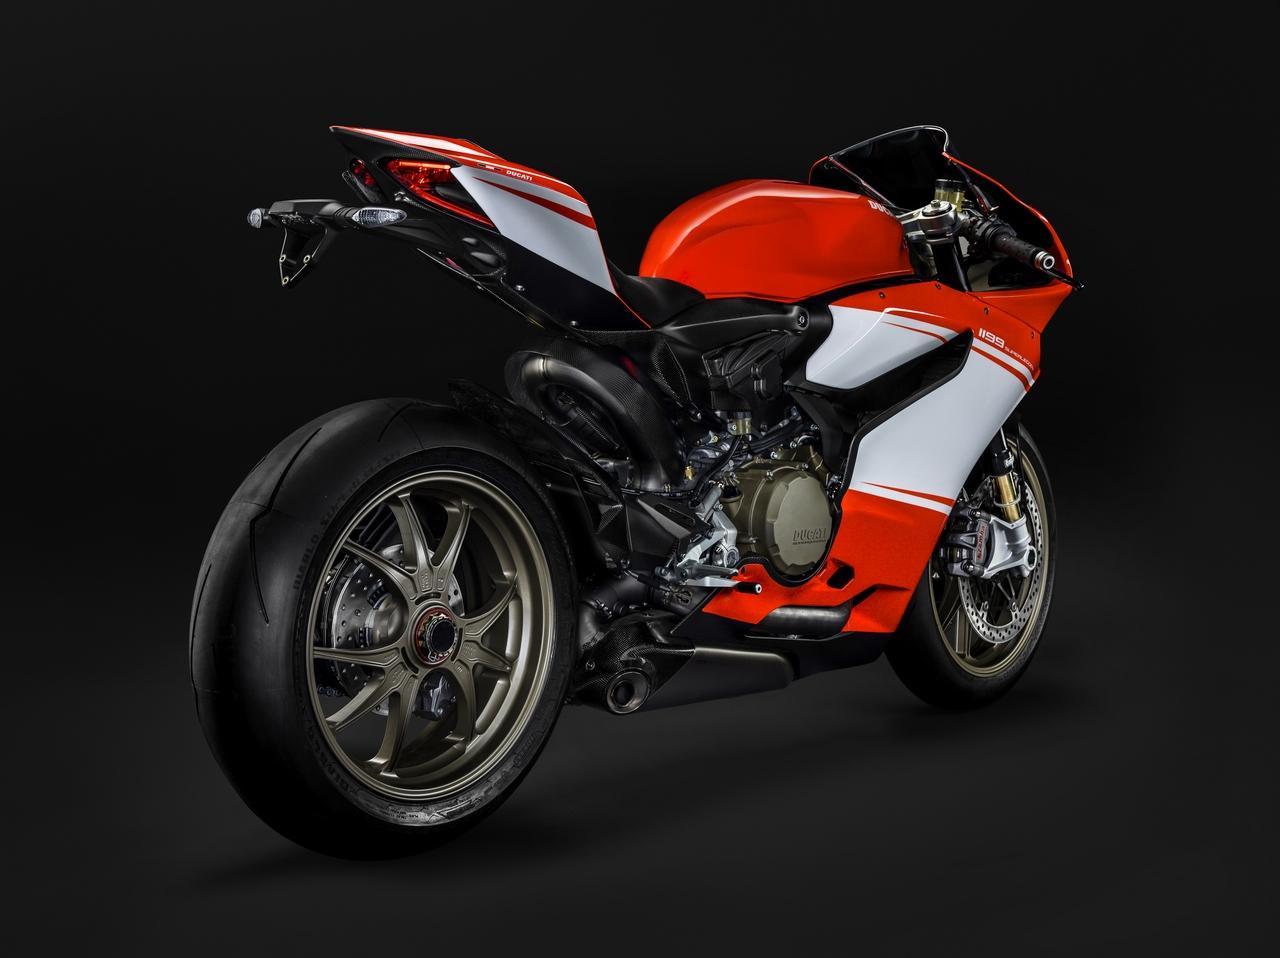 Ducati Superleggera - EICMA 2013